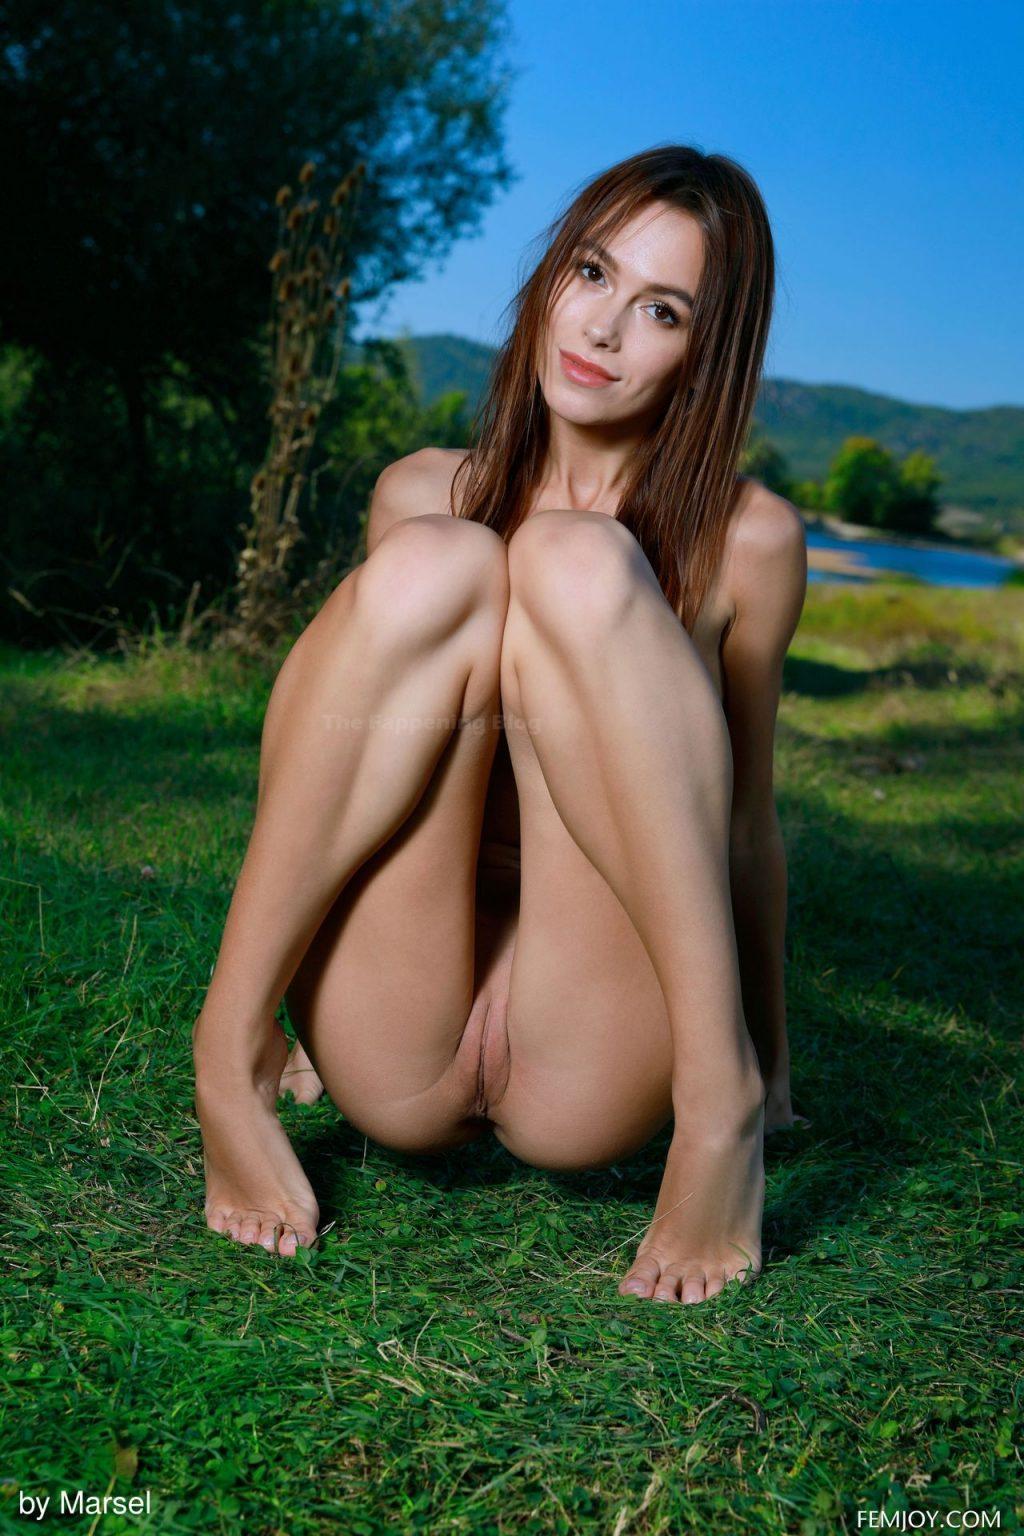 Alice Wonder Nude – Bewitching (20 Photos)